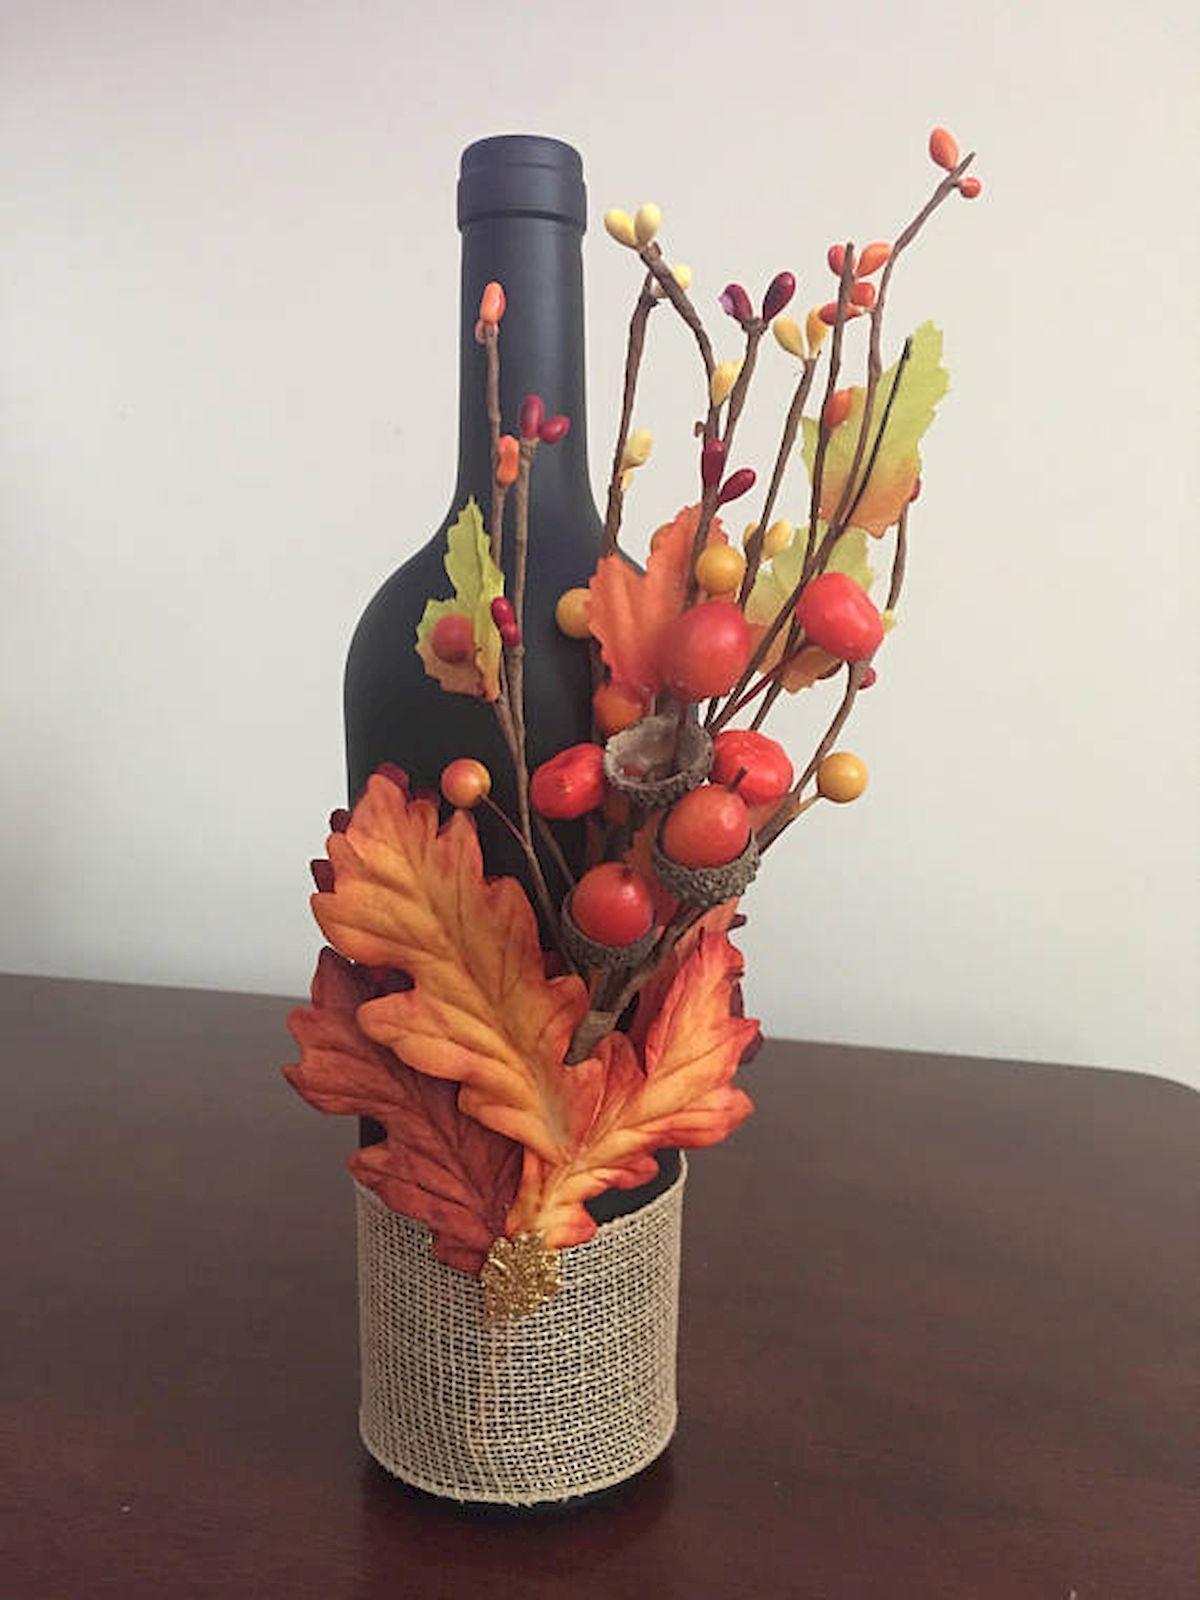 Diy For Thanksgiving Or Decorations Fall Wine Bottles Wine Bottle Diy Crafts Glass Bottle Crafts